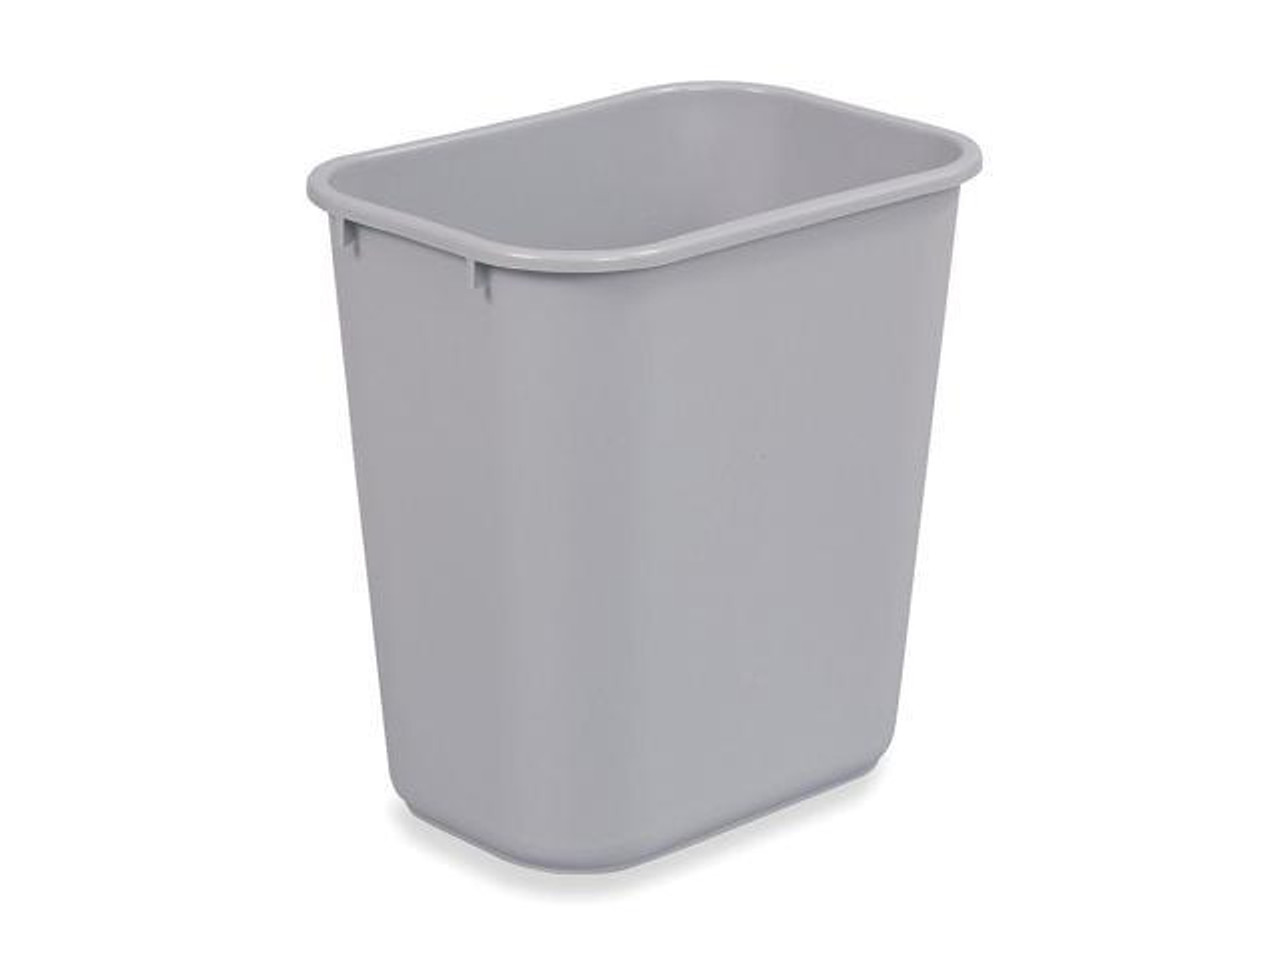 Rubbermaid Rectangular Wastebasket 26.6 L - Grey - FG295600GRAY